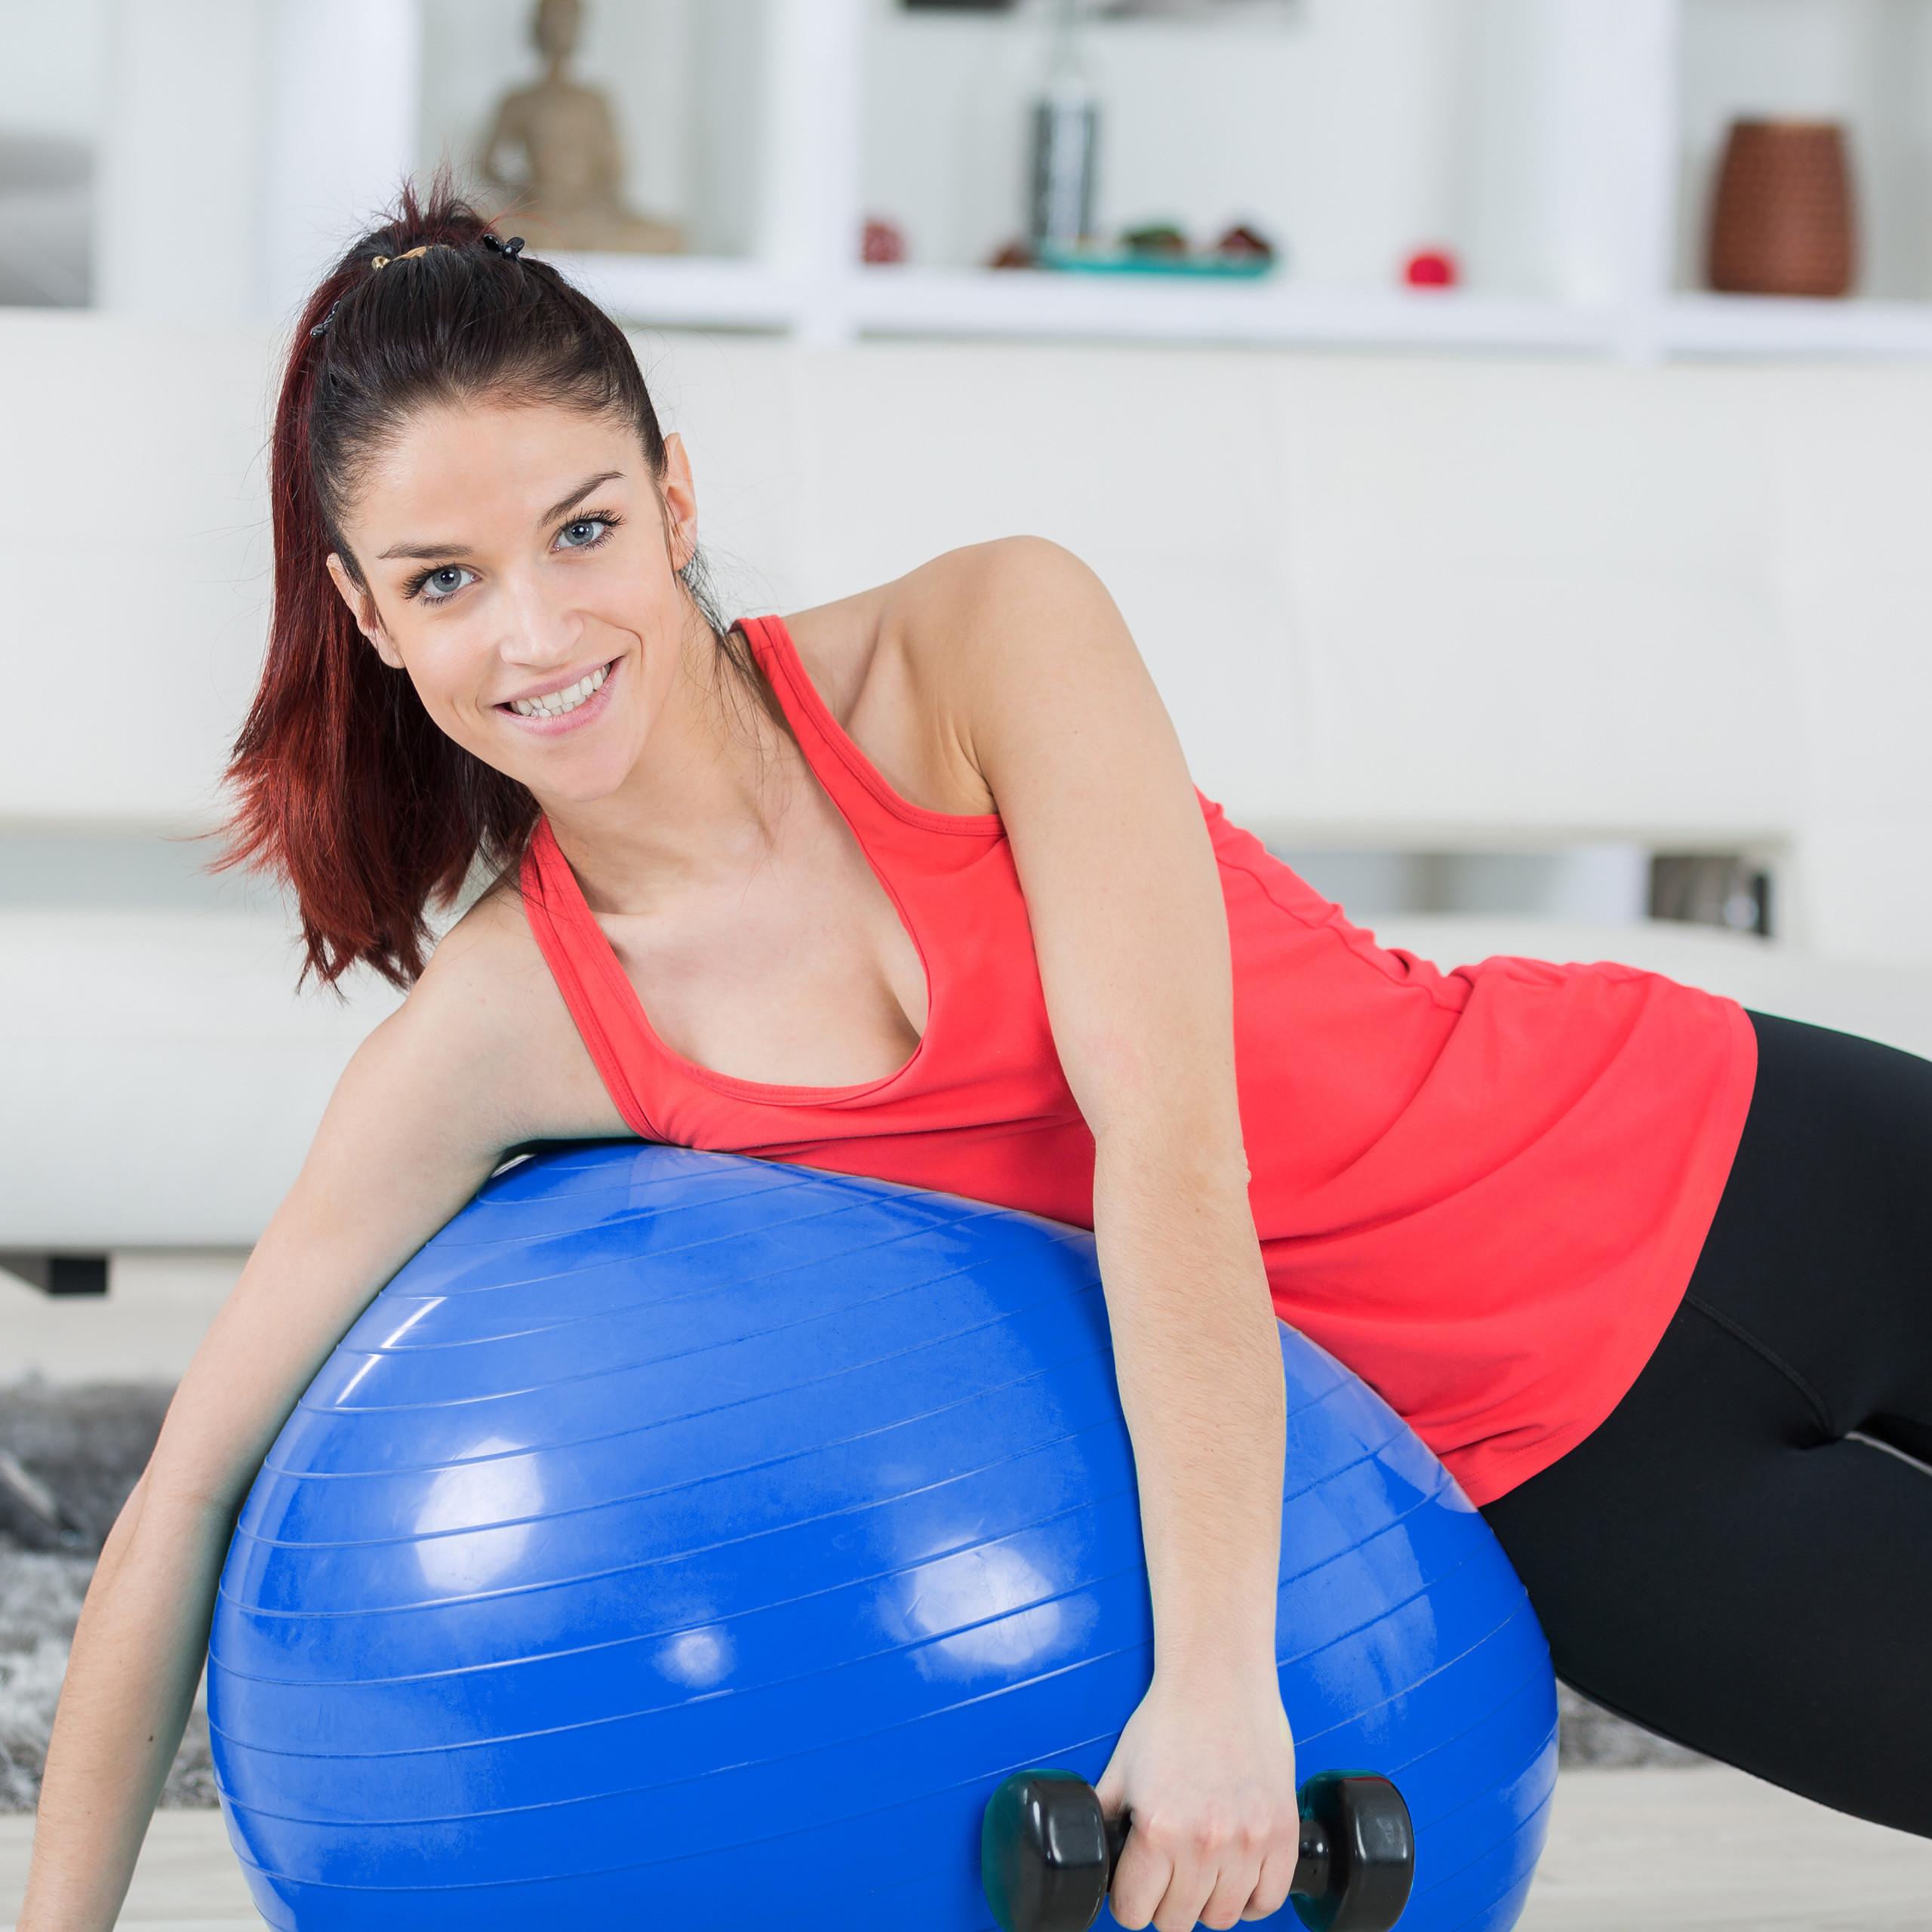 Exercise-Ball-75-cm-PVC-Yoga-Ball-Office-Seat-Gym-Ball-Pilates thumbnail 8